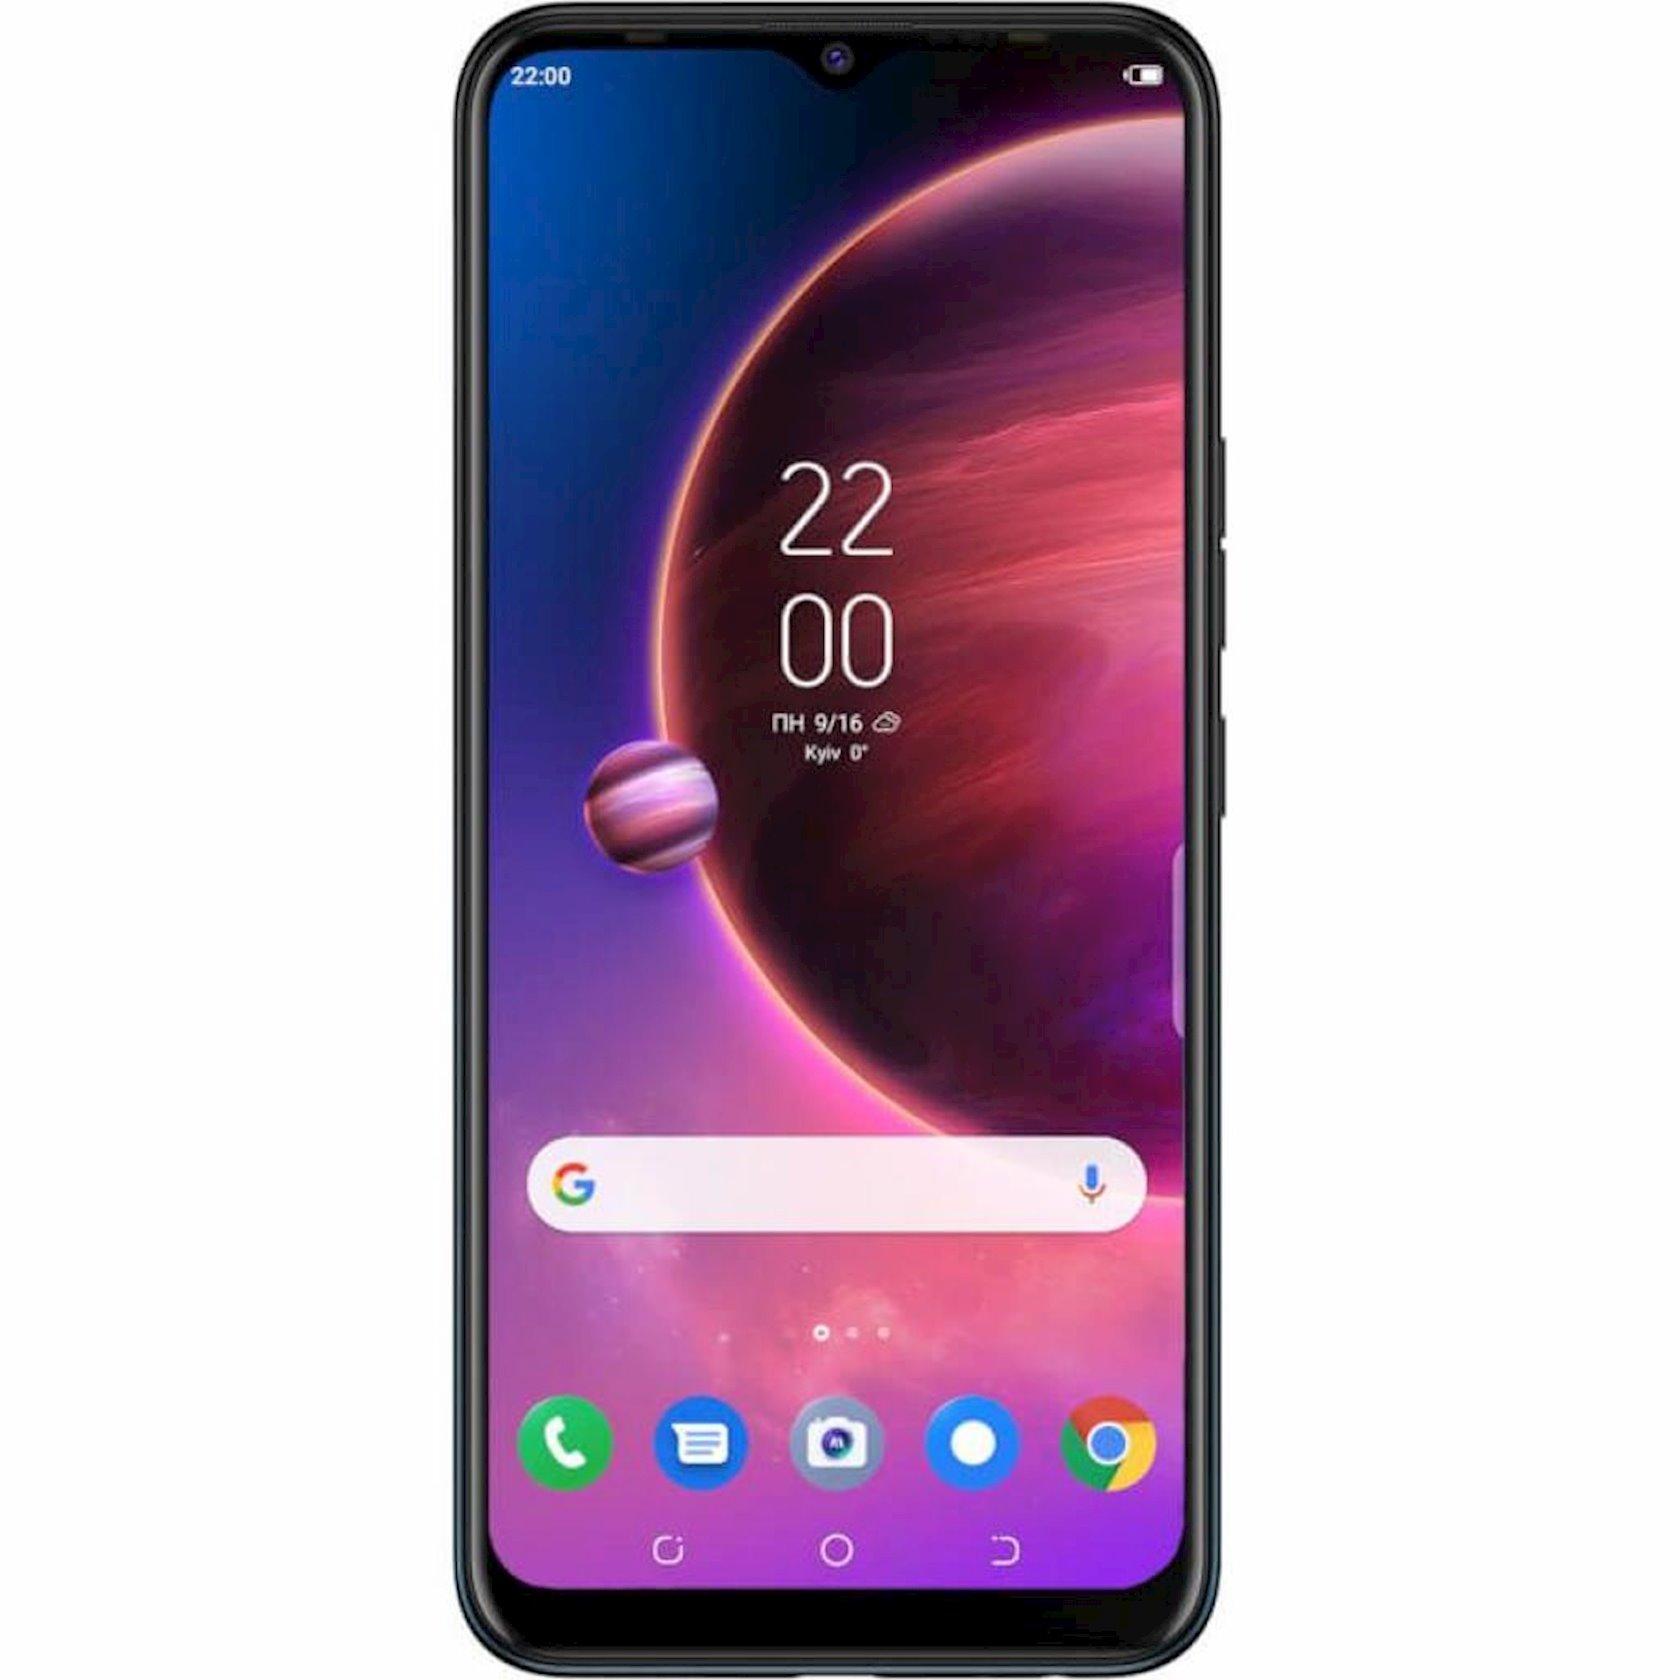 Smartfon Tecno Camon 12 4GB/64GB Dark Jade